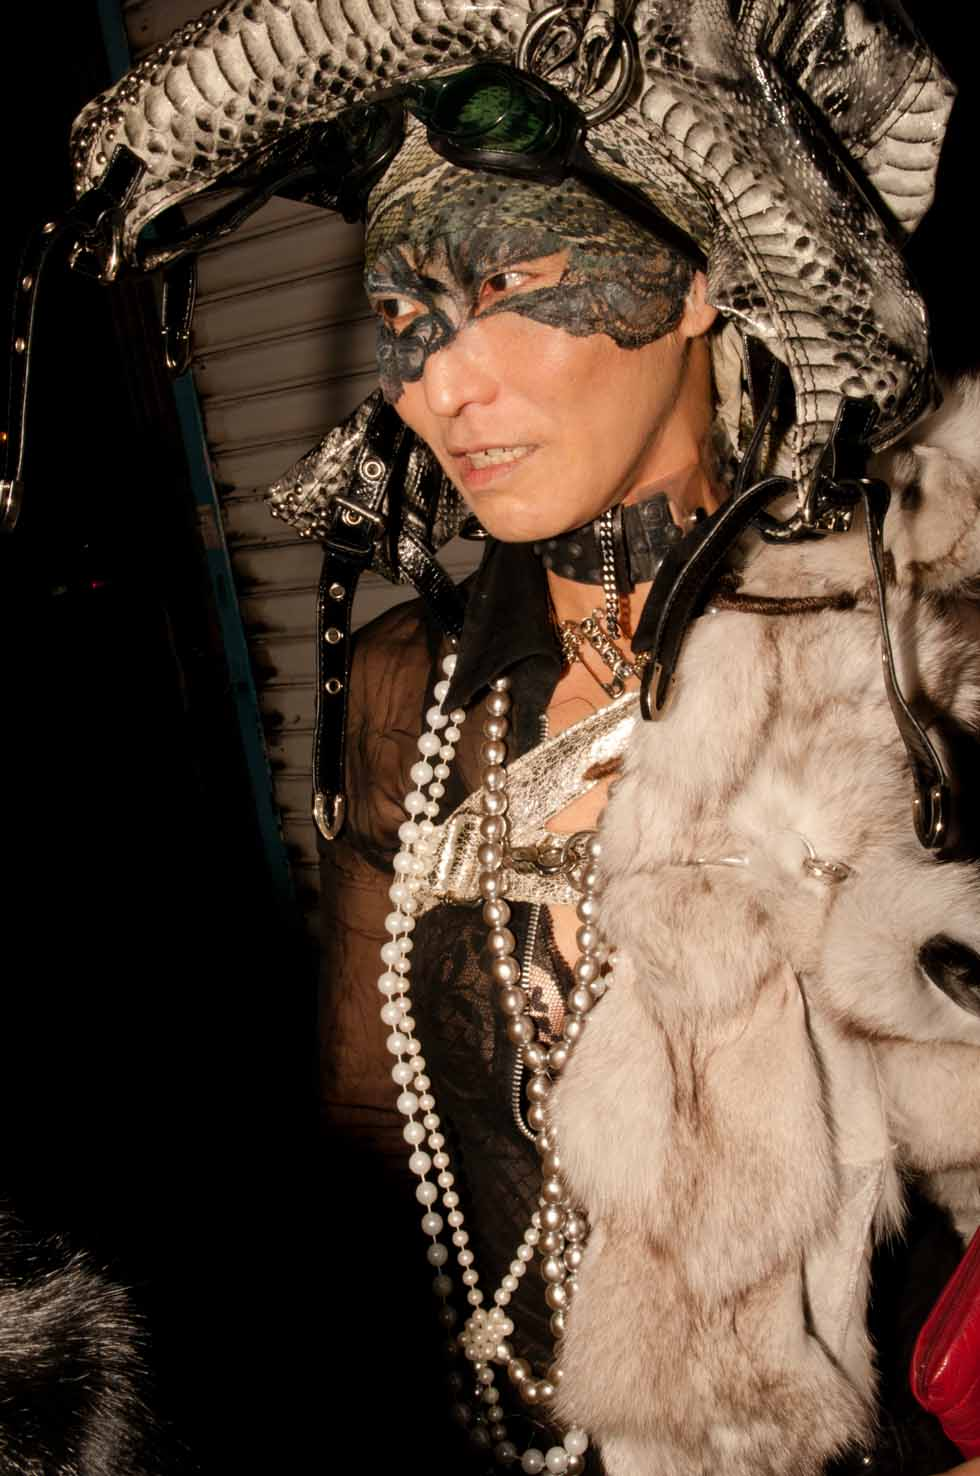 zum-schneider-nyc-2012-karneval-apocalyptika-5450.jpg